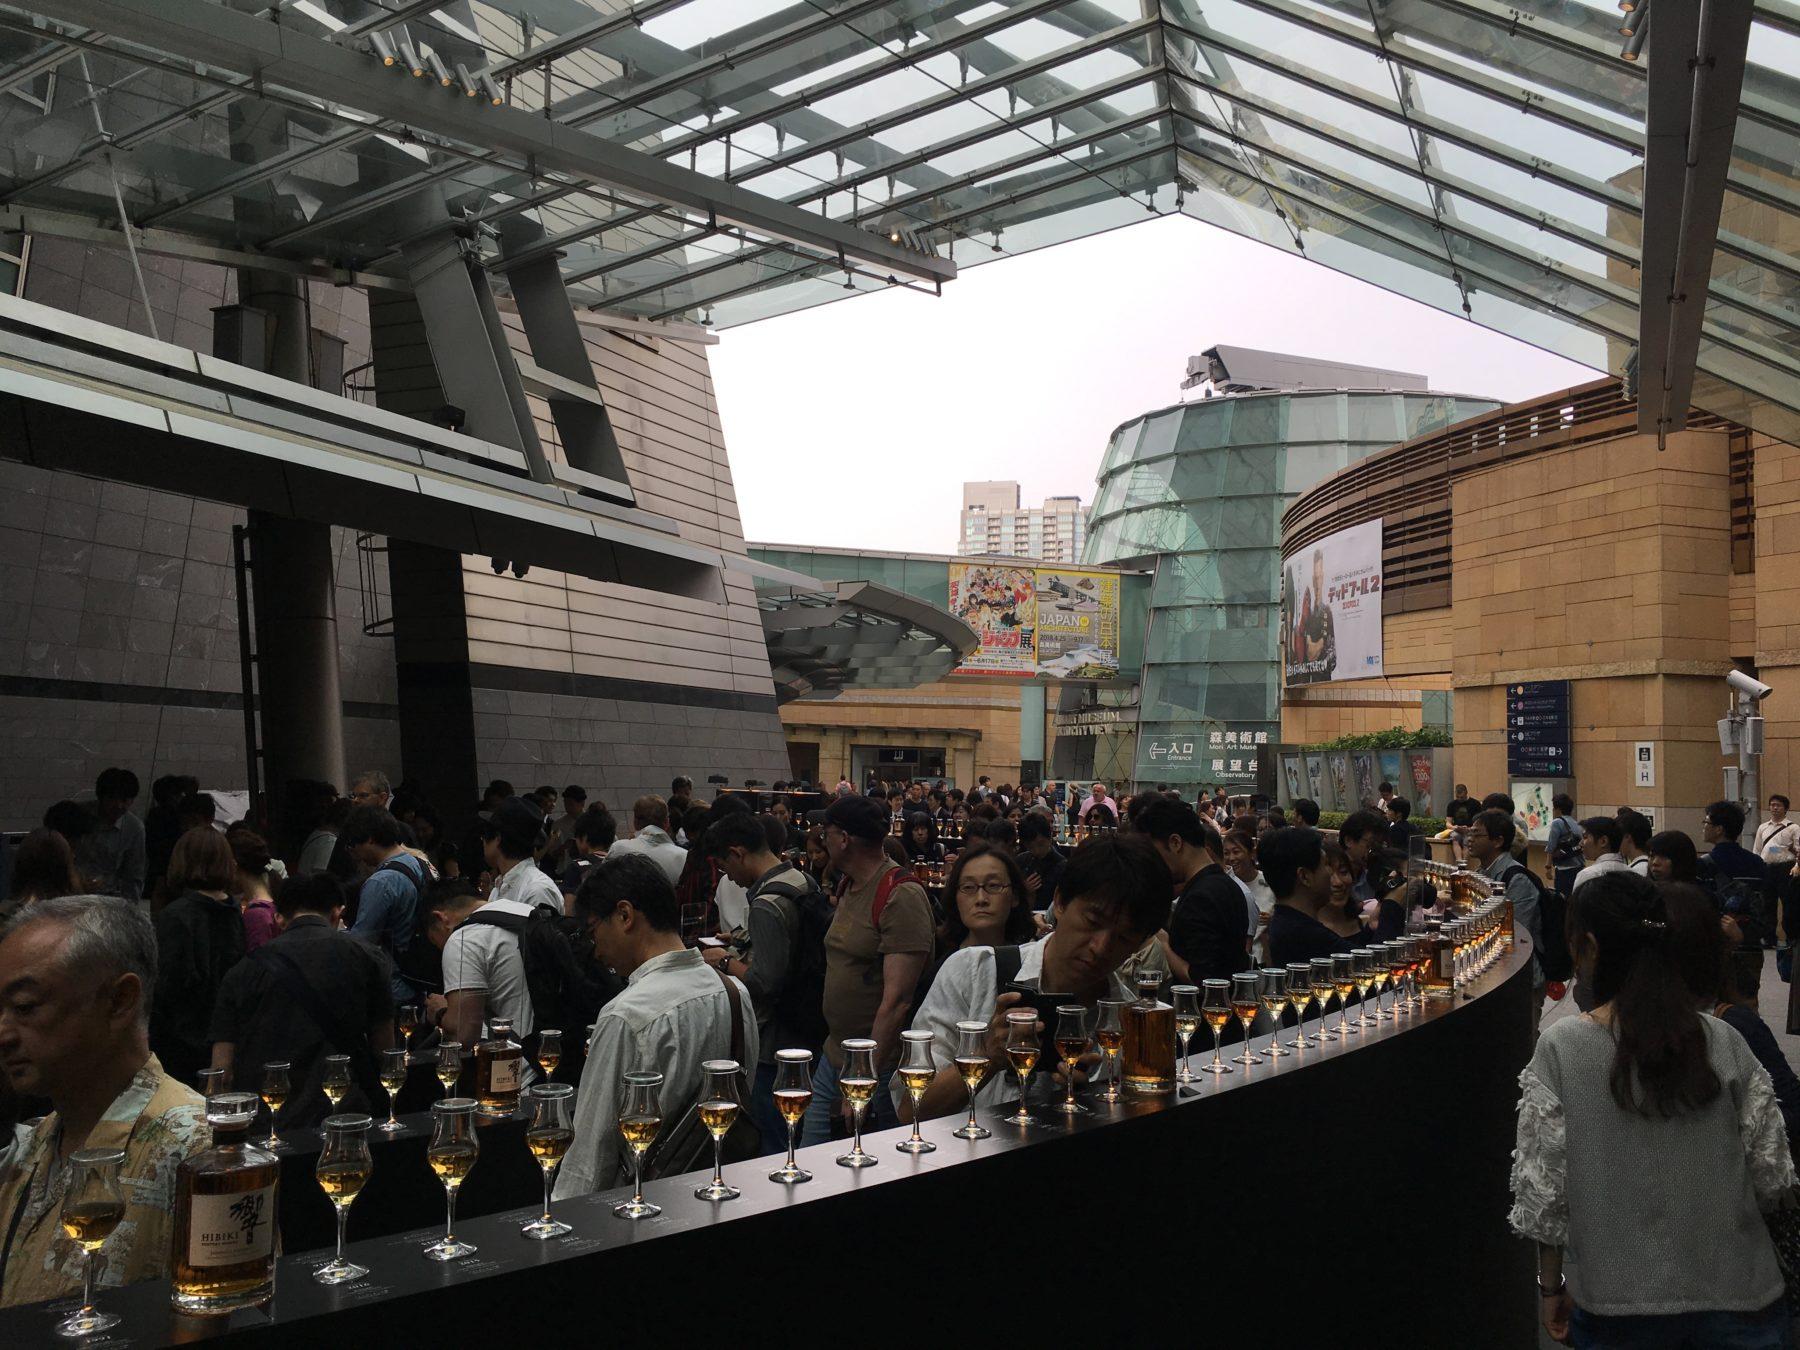 Roppongi Art Night 2018